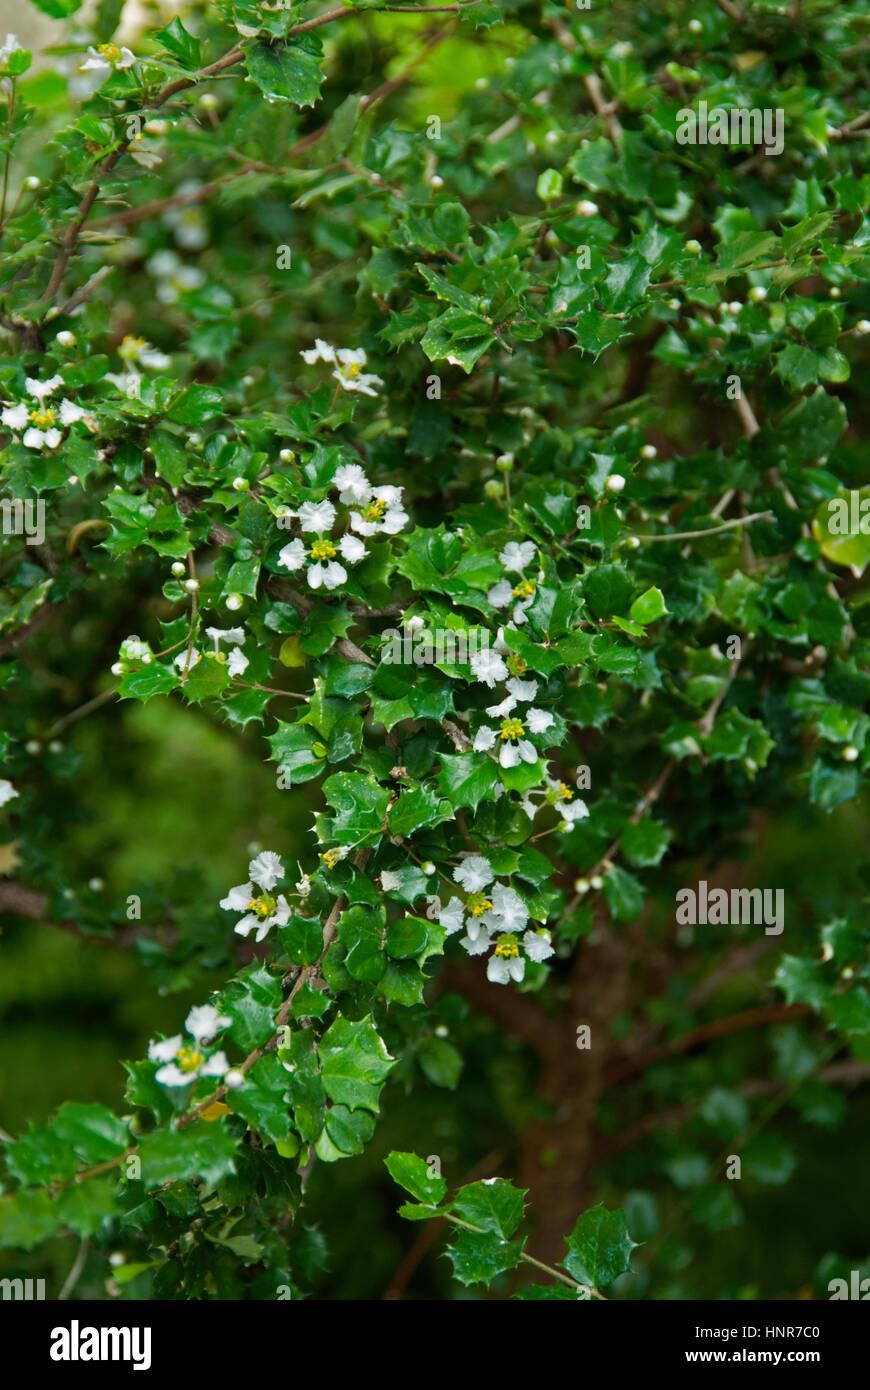 Malpighia coccigeria, Singapor Holly, - Stock Image